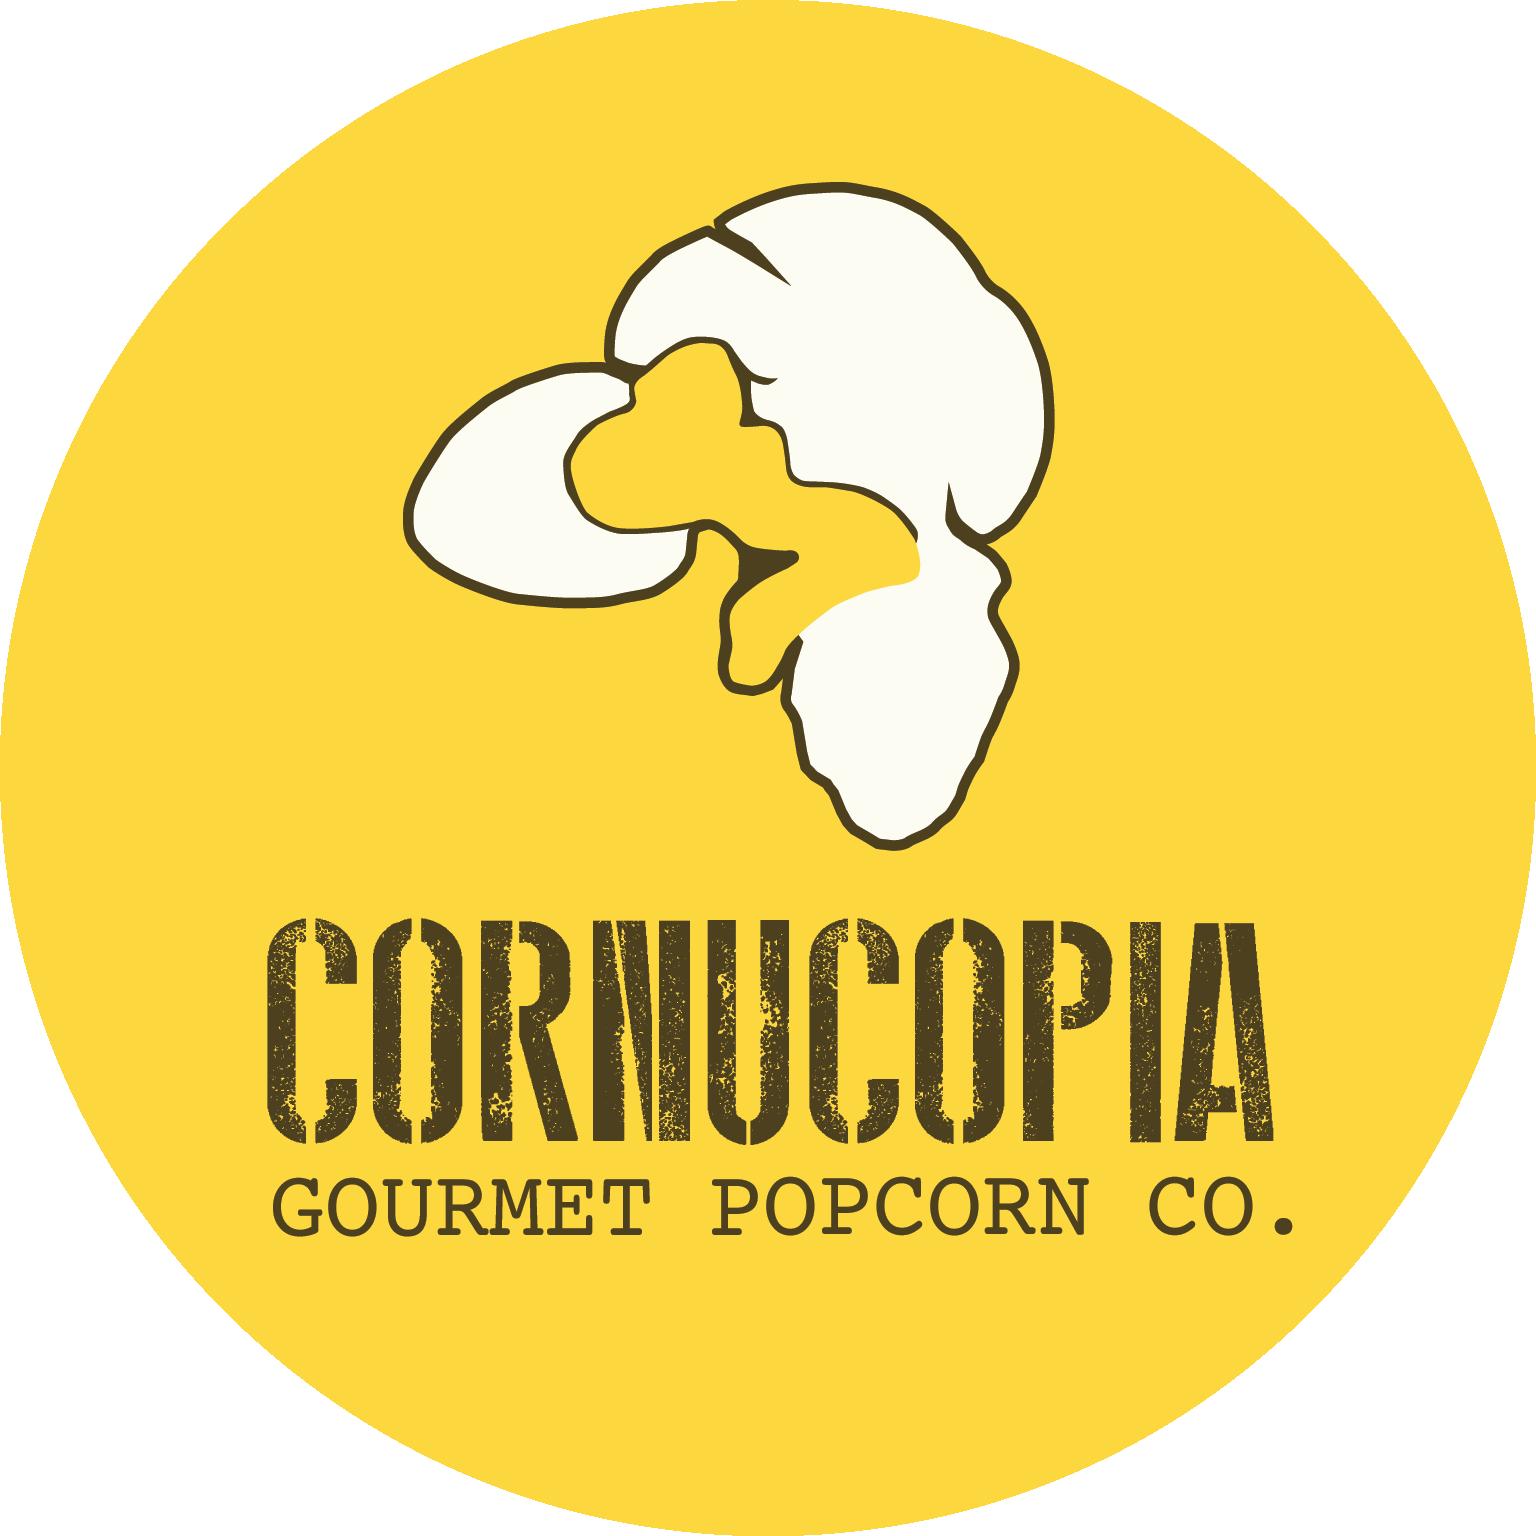 Cornucopia Gourmet Popcorn Co.